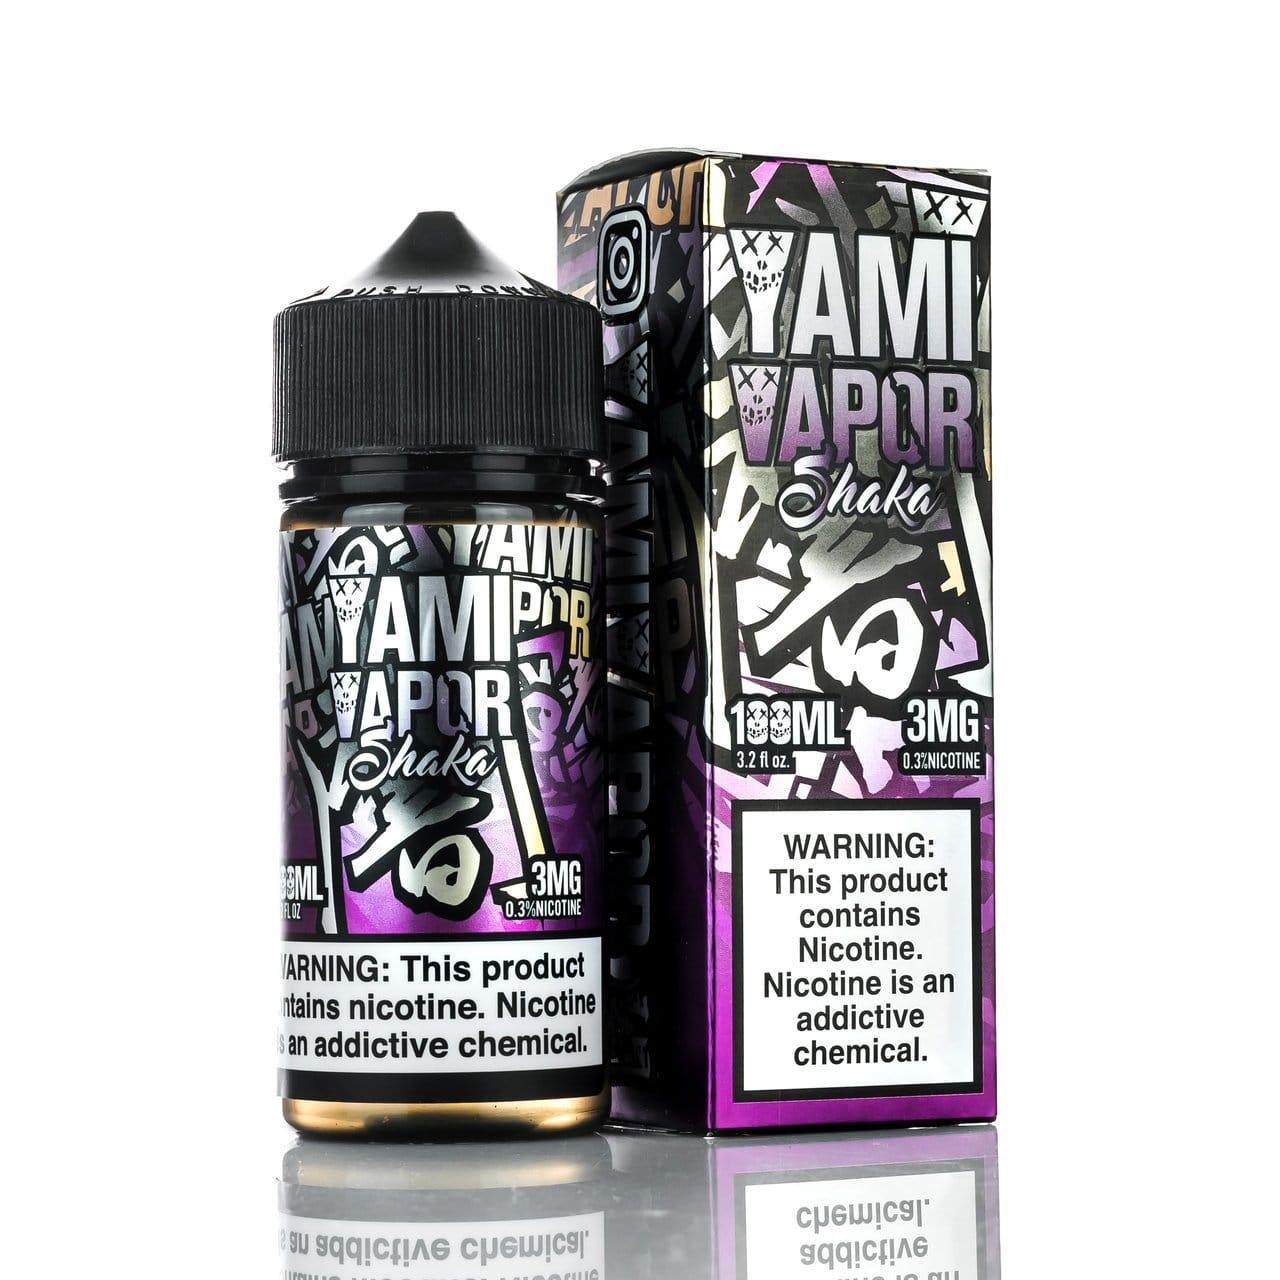 Yami Vapor Shaka 100ml & 30ml Vape Juice